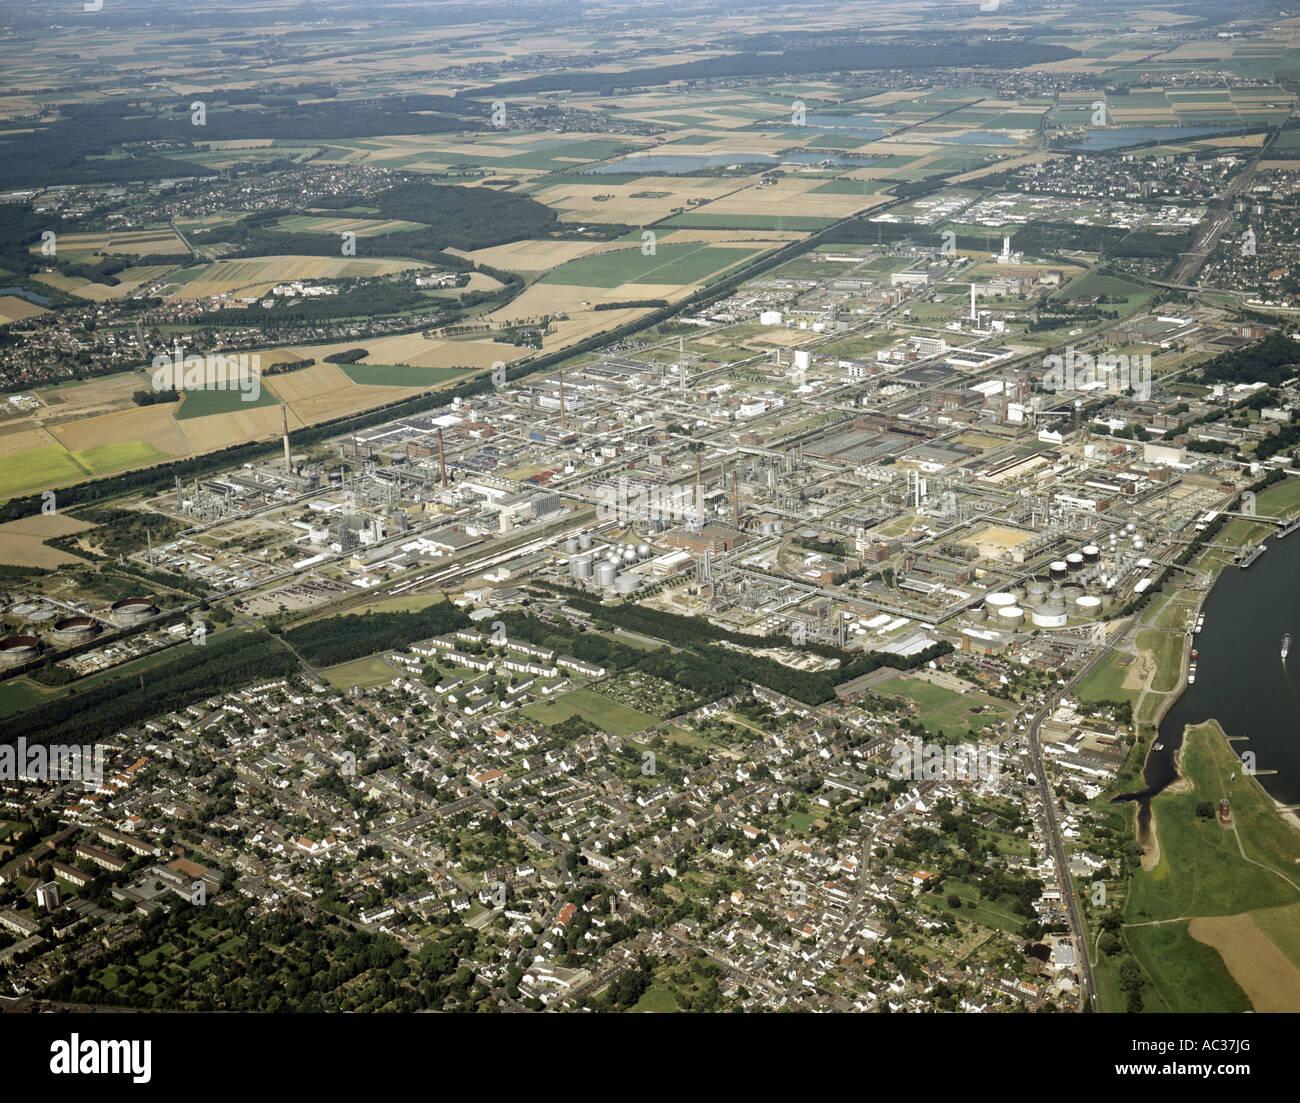 EC Petrochemistry and Bayer AG, Germany, North Rhine-Westphalia, Dormagen - Stock Image